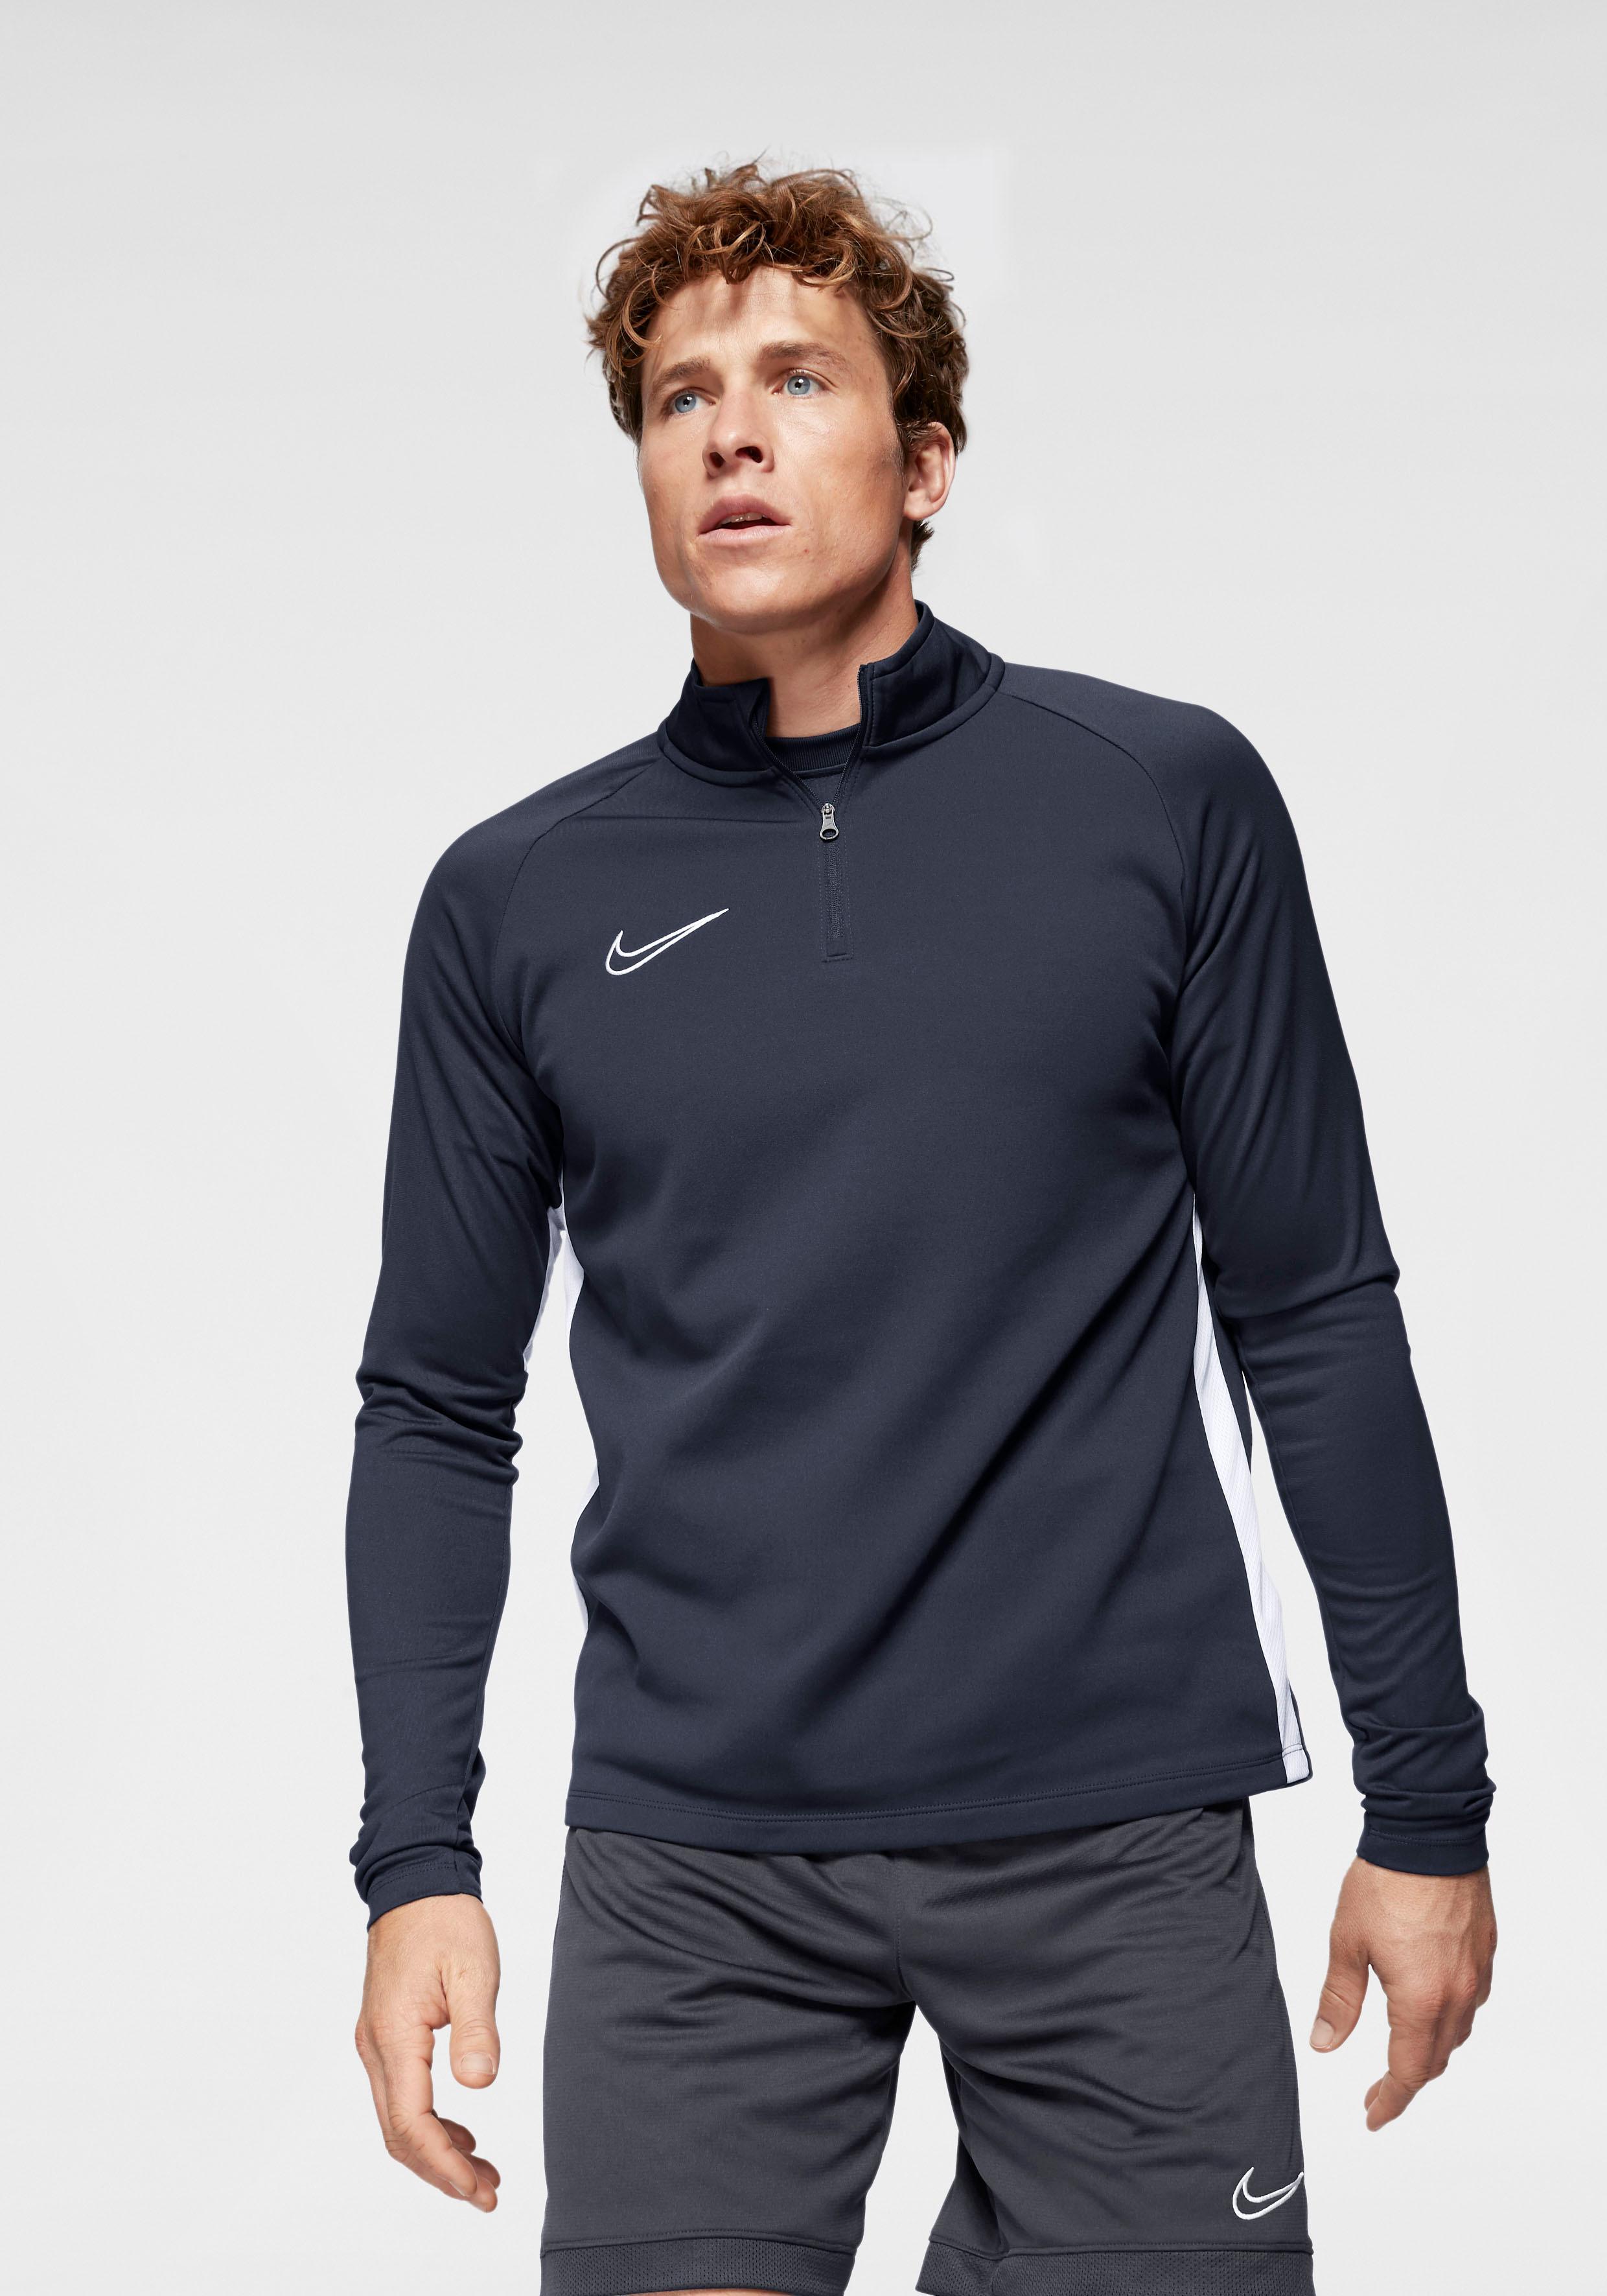 Nike Trainingsshirt Nike Dry-FIT Academy Men's Soccer Drill Top | Sportbekleidung > Sportshirts > Funktionsshirts | Blau | Nike